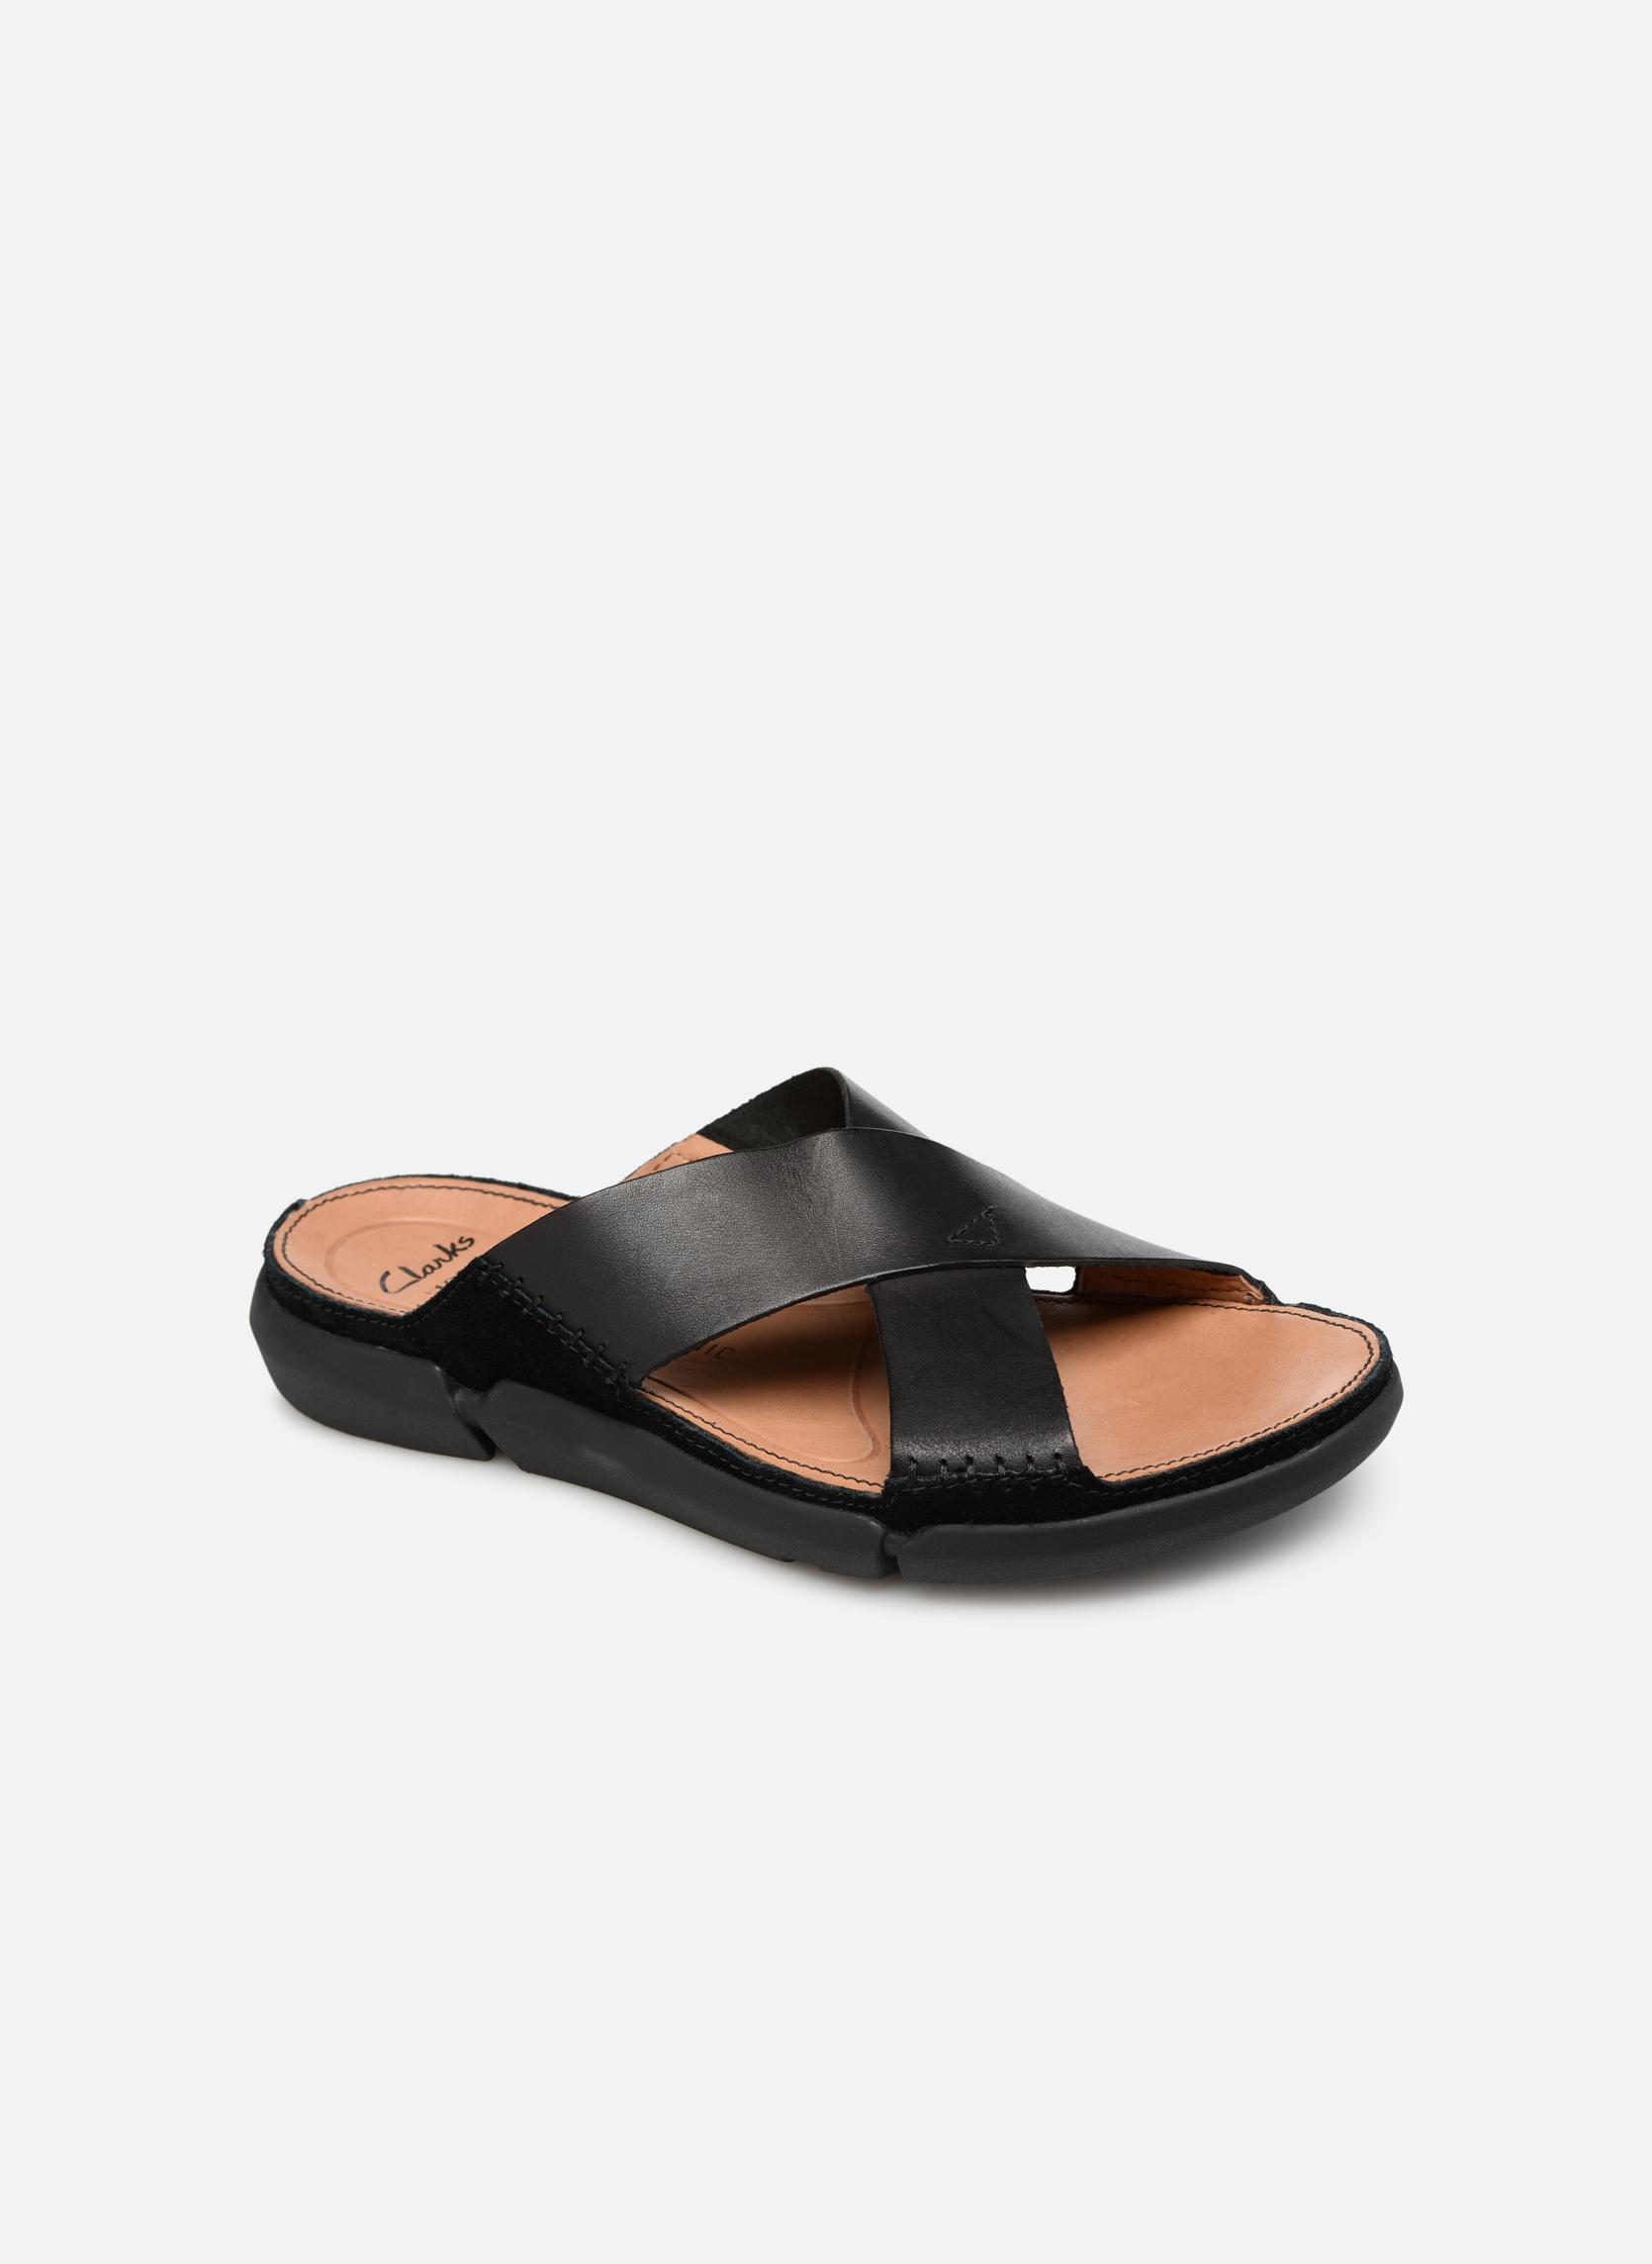 Sandals Men Trisand Cross